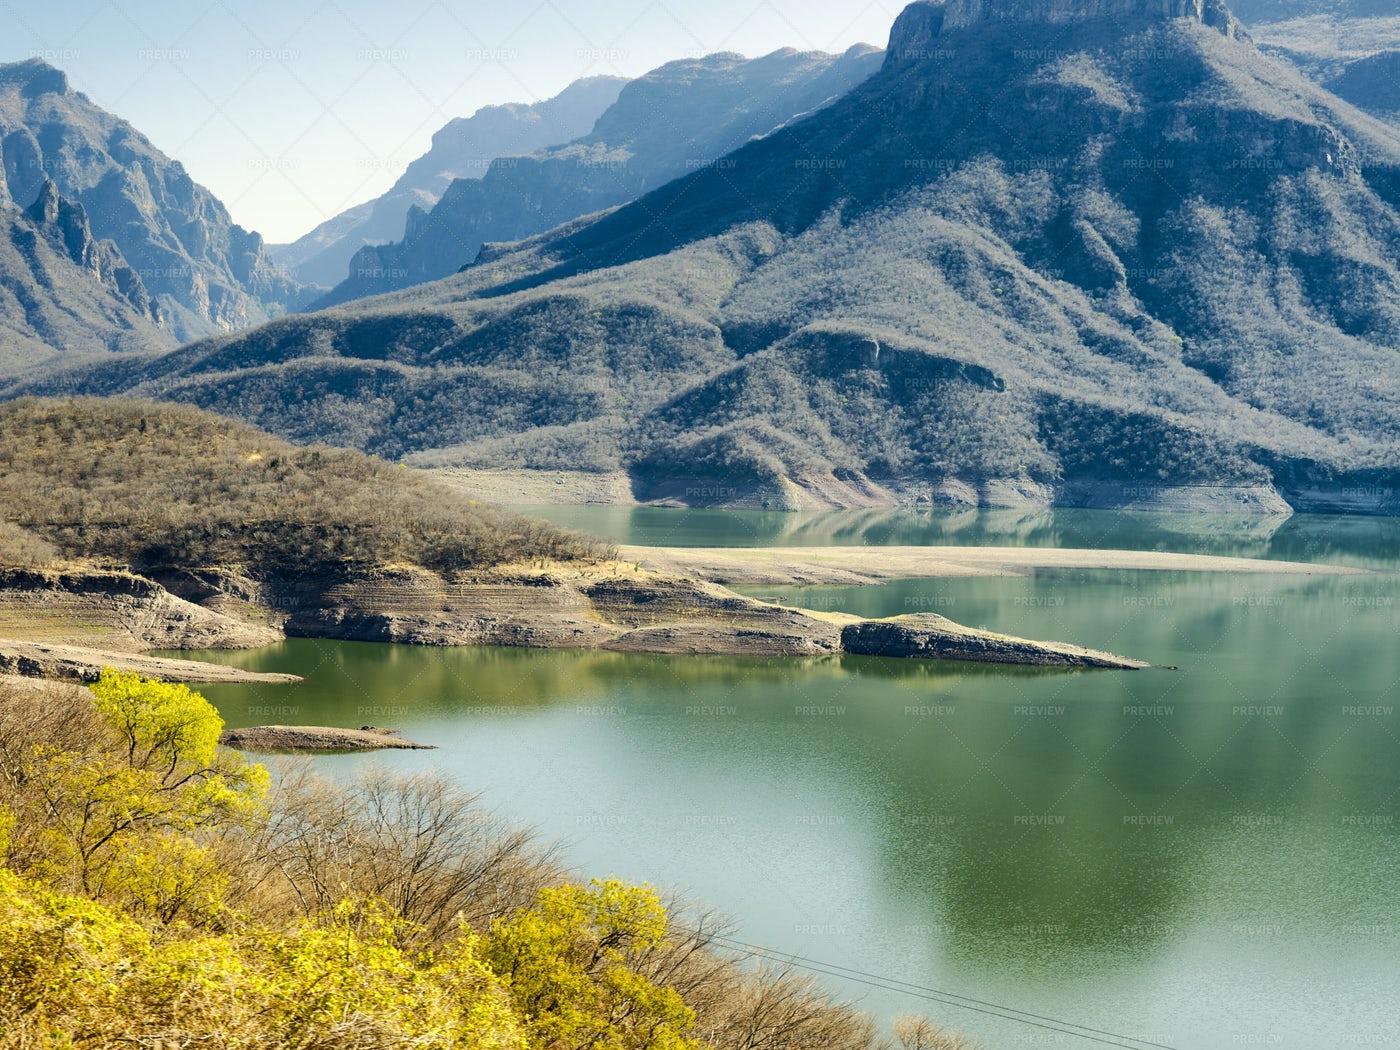 Mountainous Landscapes Of Copper Canyon: Stock Photos